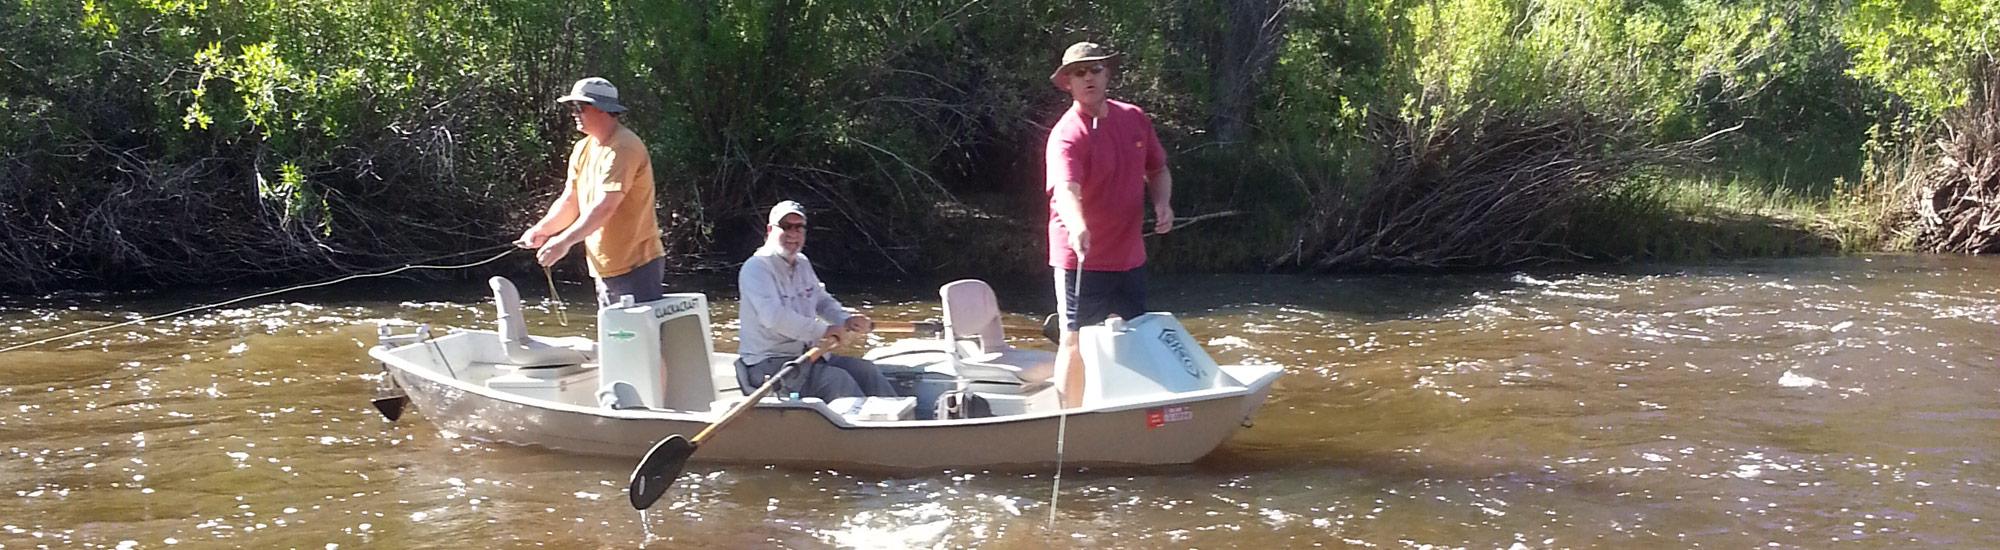 wyoming fishing guide